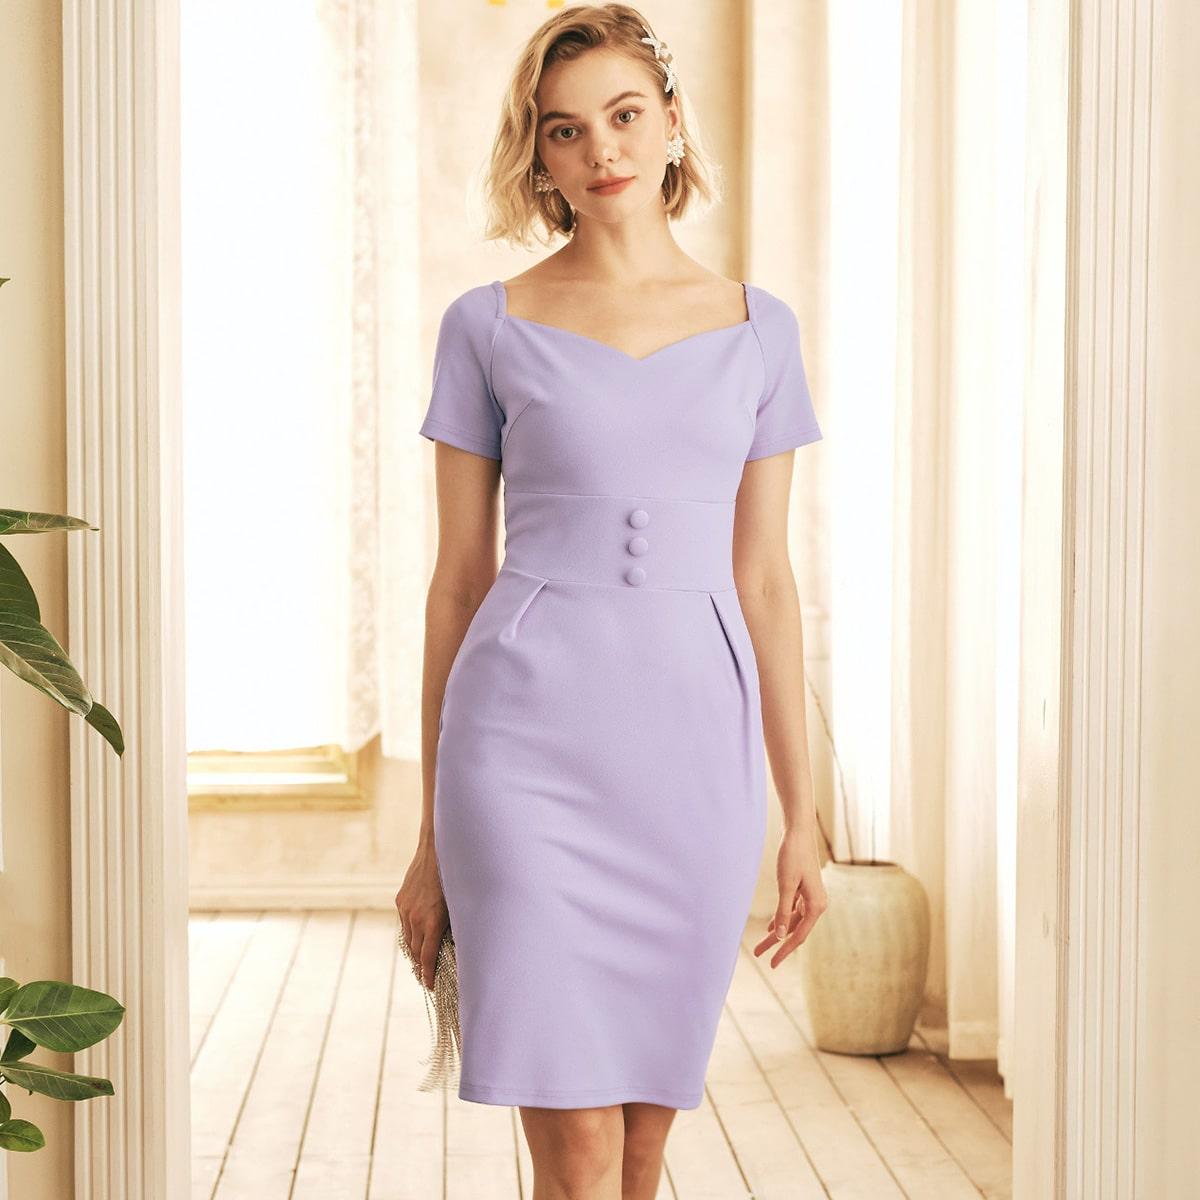 Платье с глубоким декольте с молнией разрез SheIn swdress31210409268